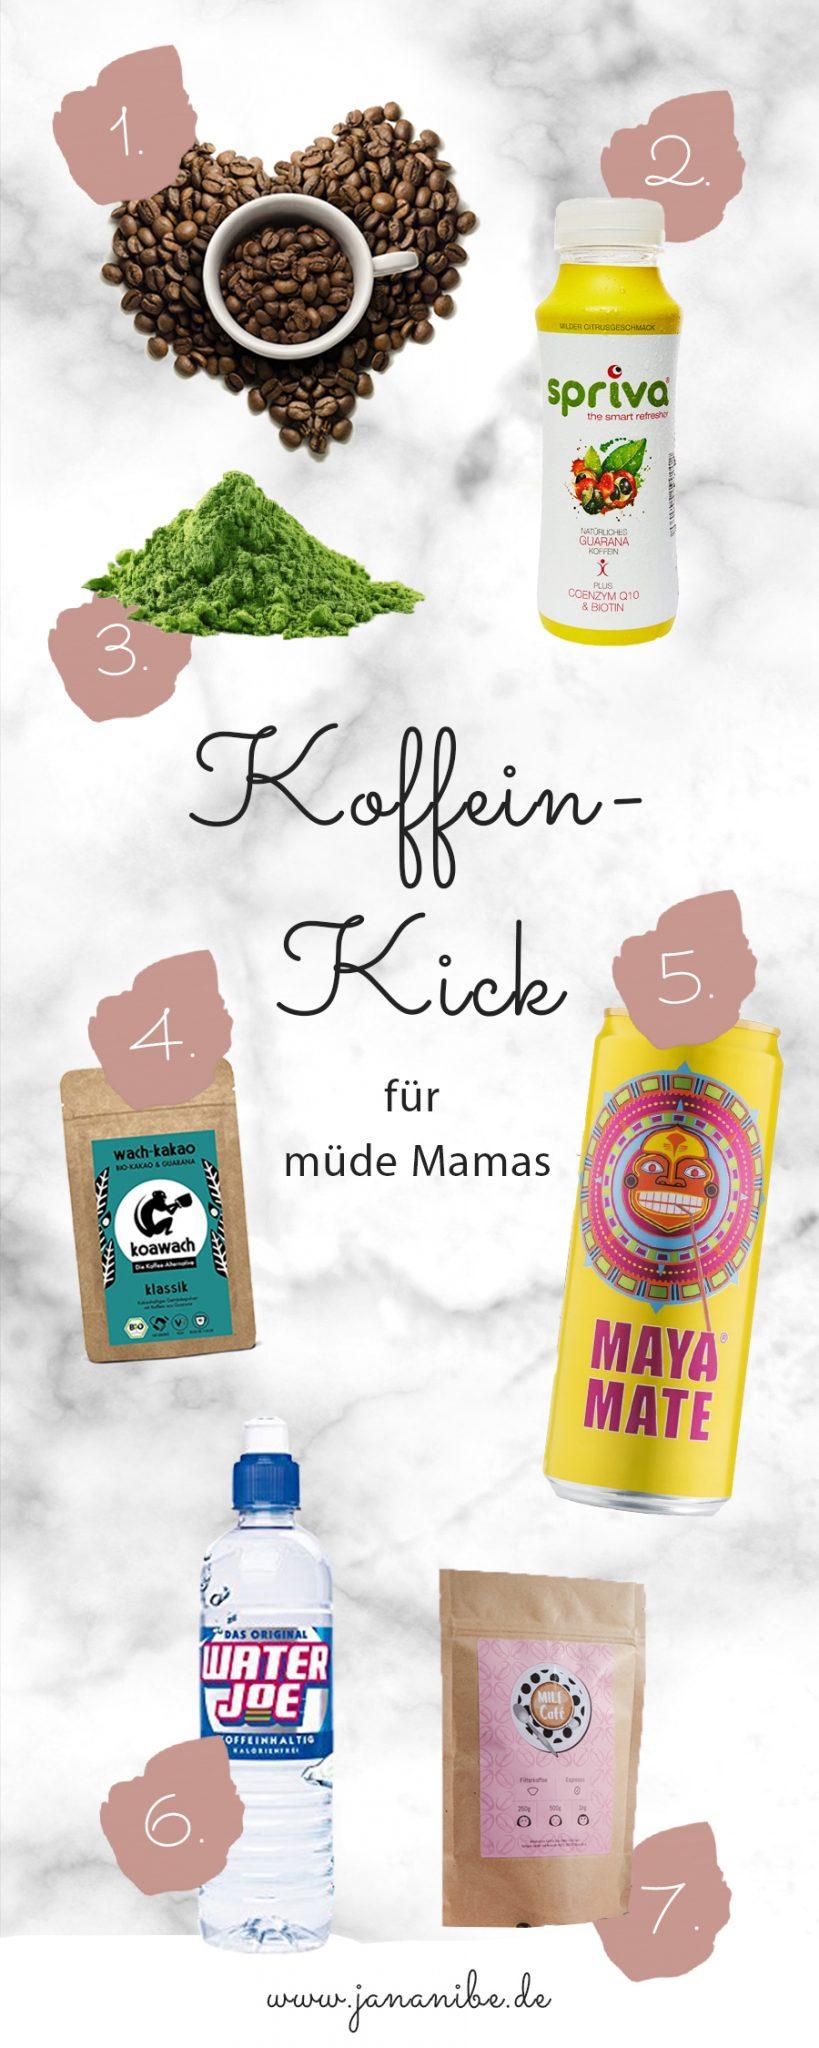 Koffein-Kick für müde Mamas